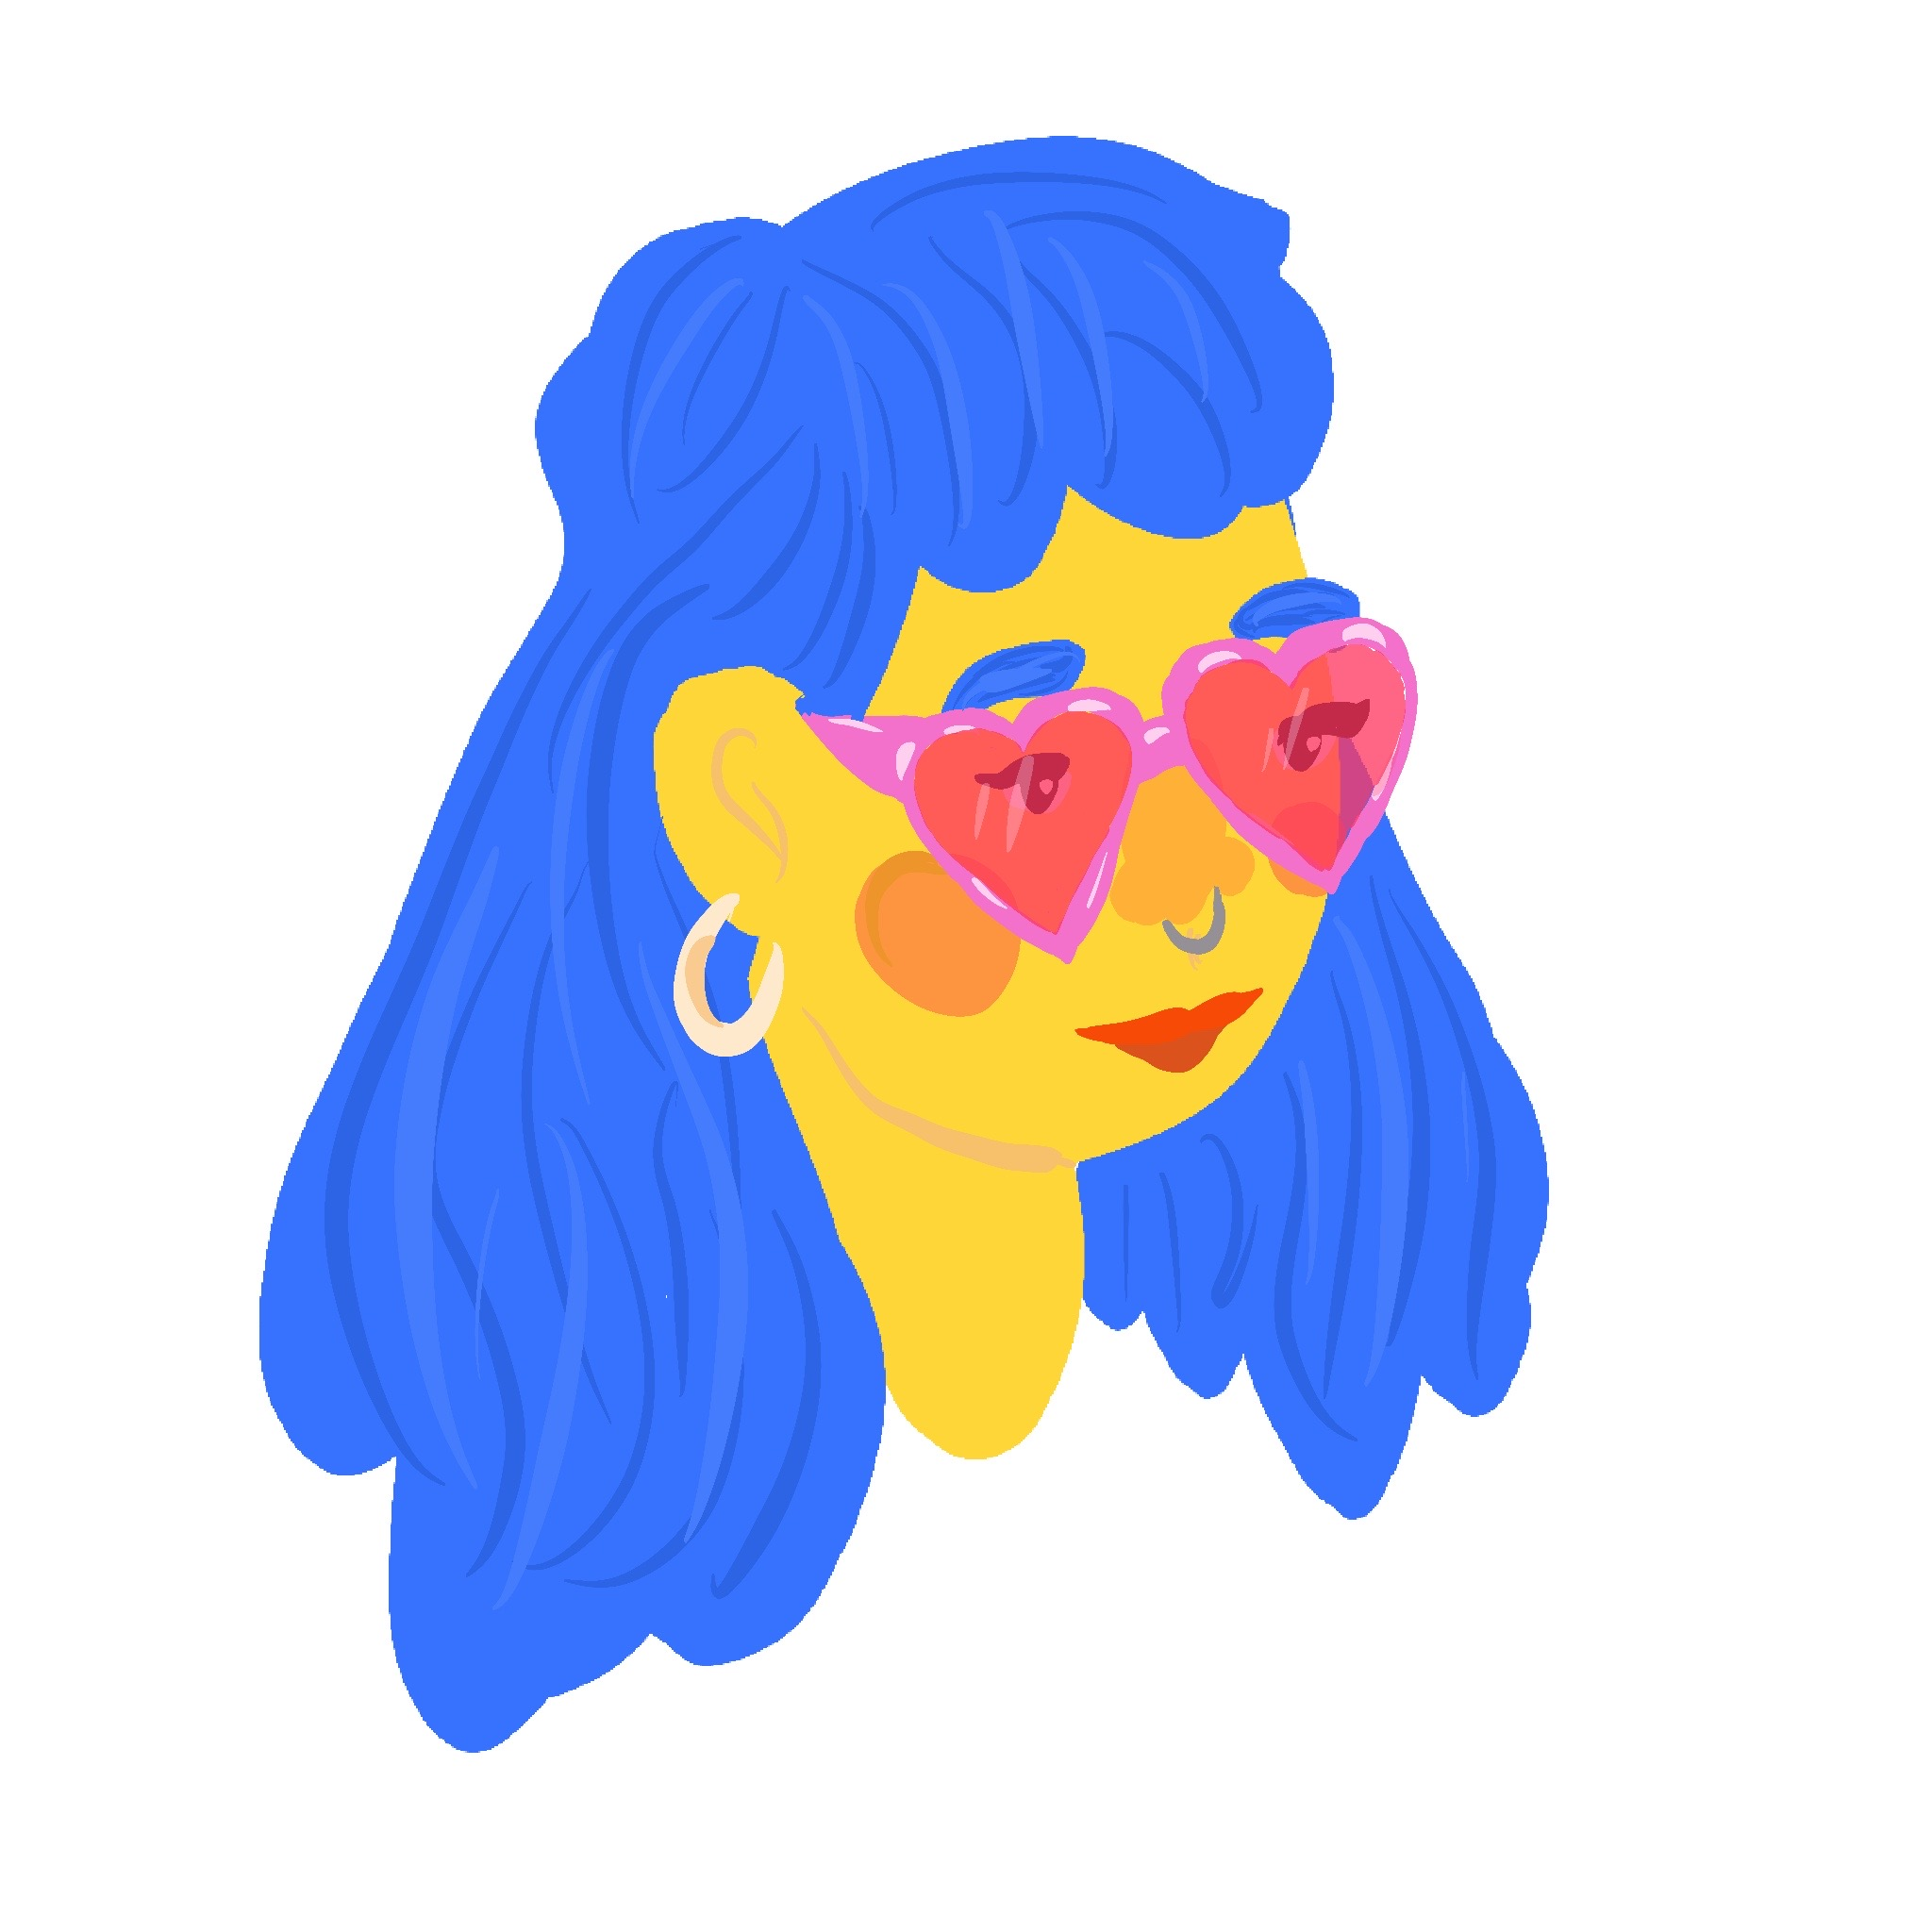 Heartglassesgirl